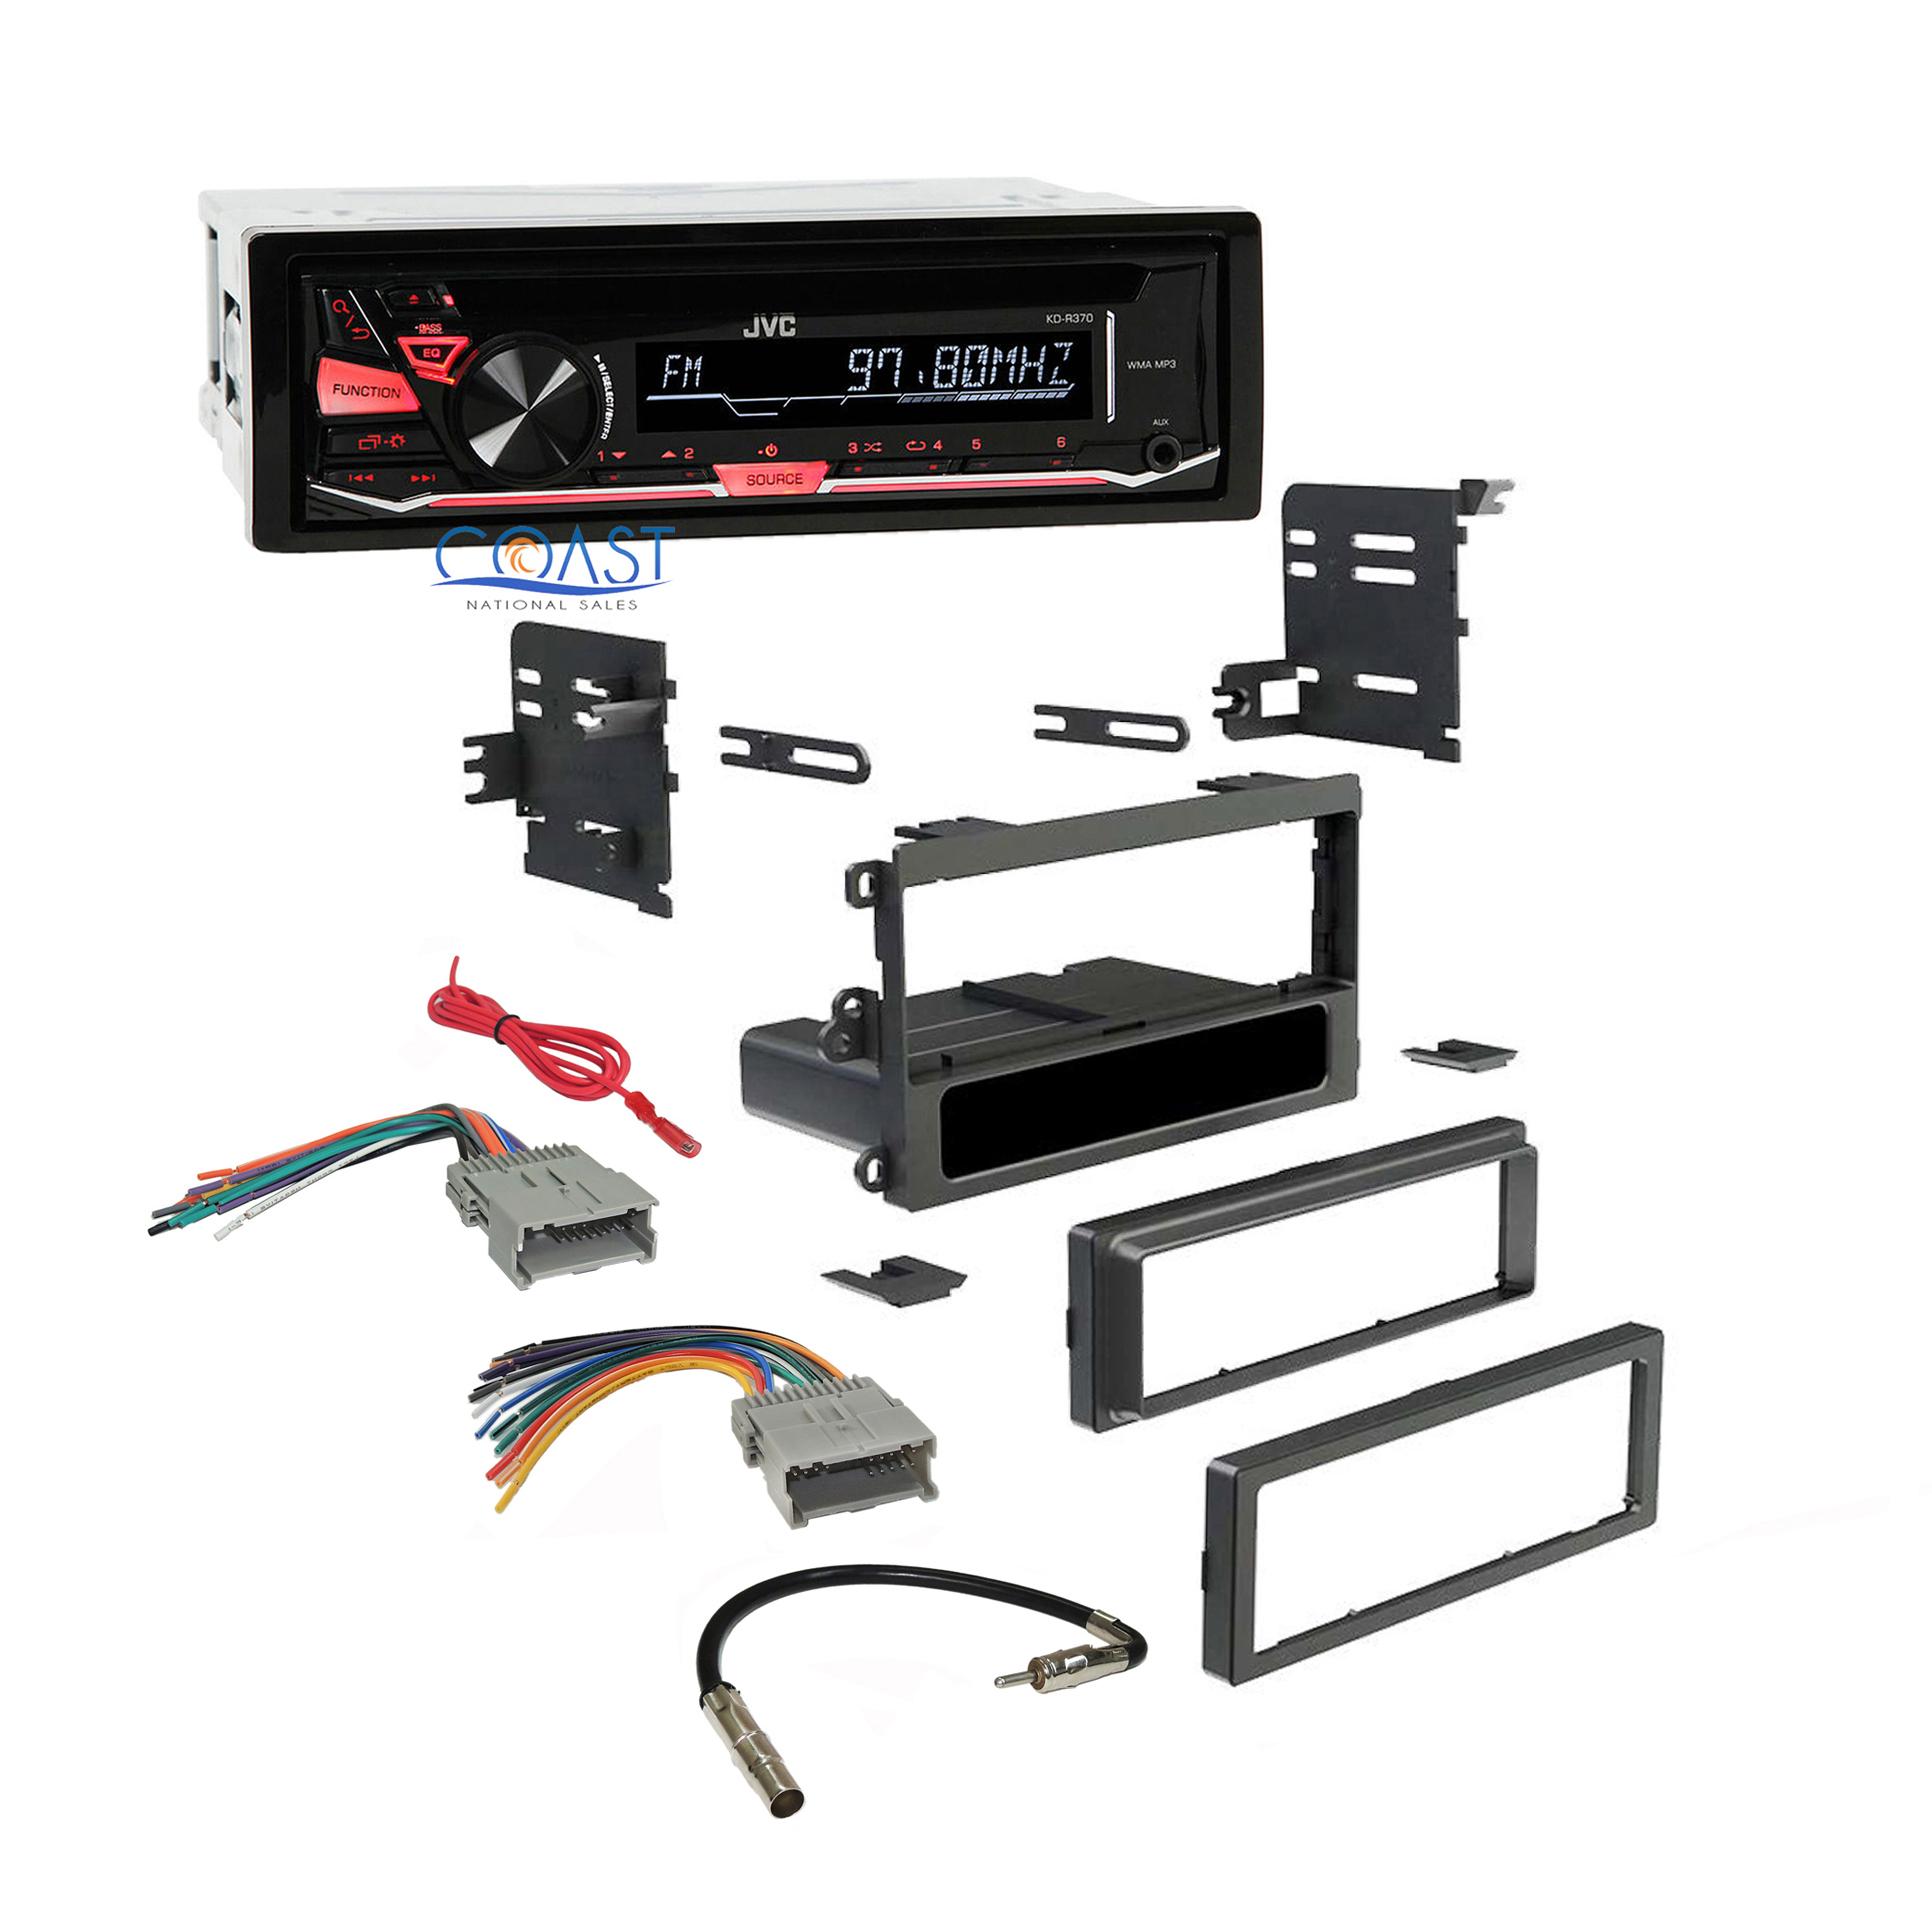 [ZTBE_9966]  Estéreo Radio JVC doble DIN Dash Kit de alambre arnés para 1992-up Chevy  Gmc Pontiac | eBay | Jvc Wire Harness Chevy |  | eBay